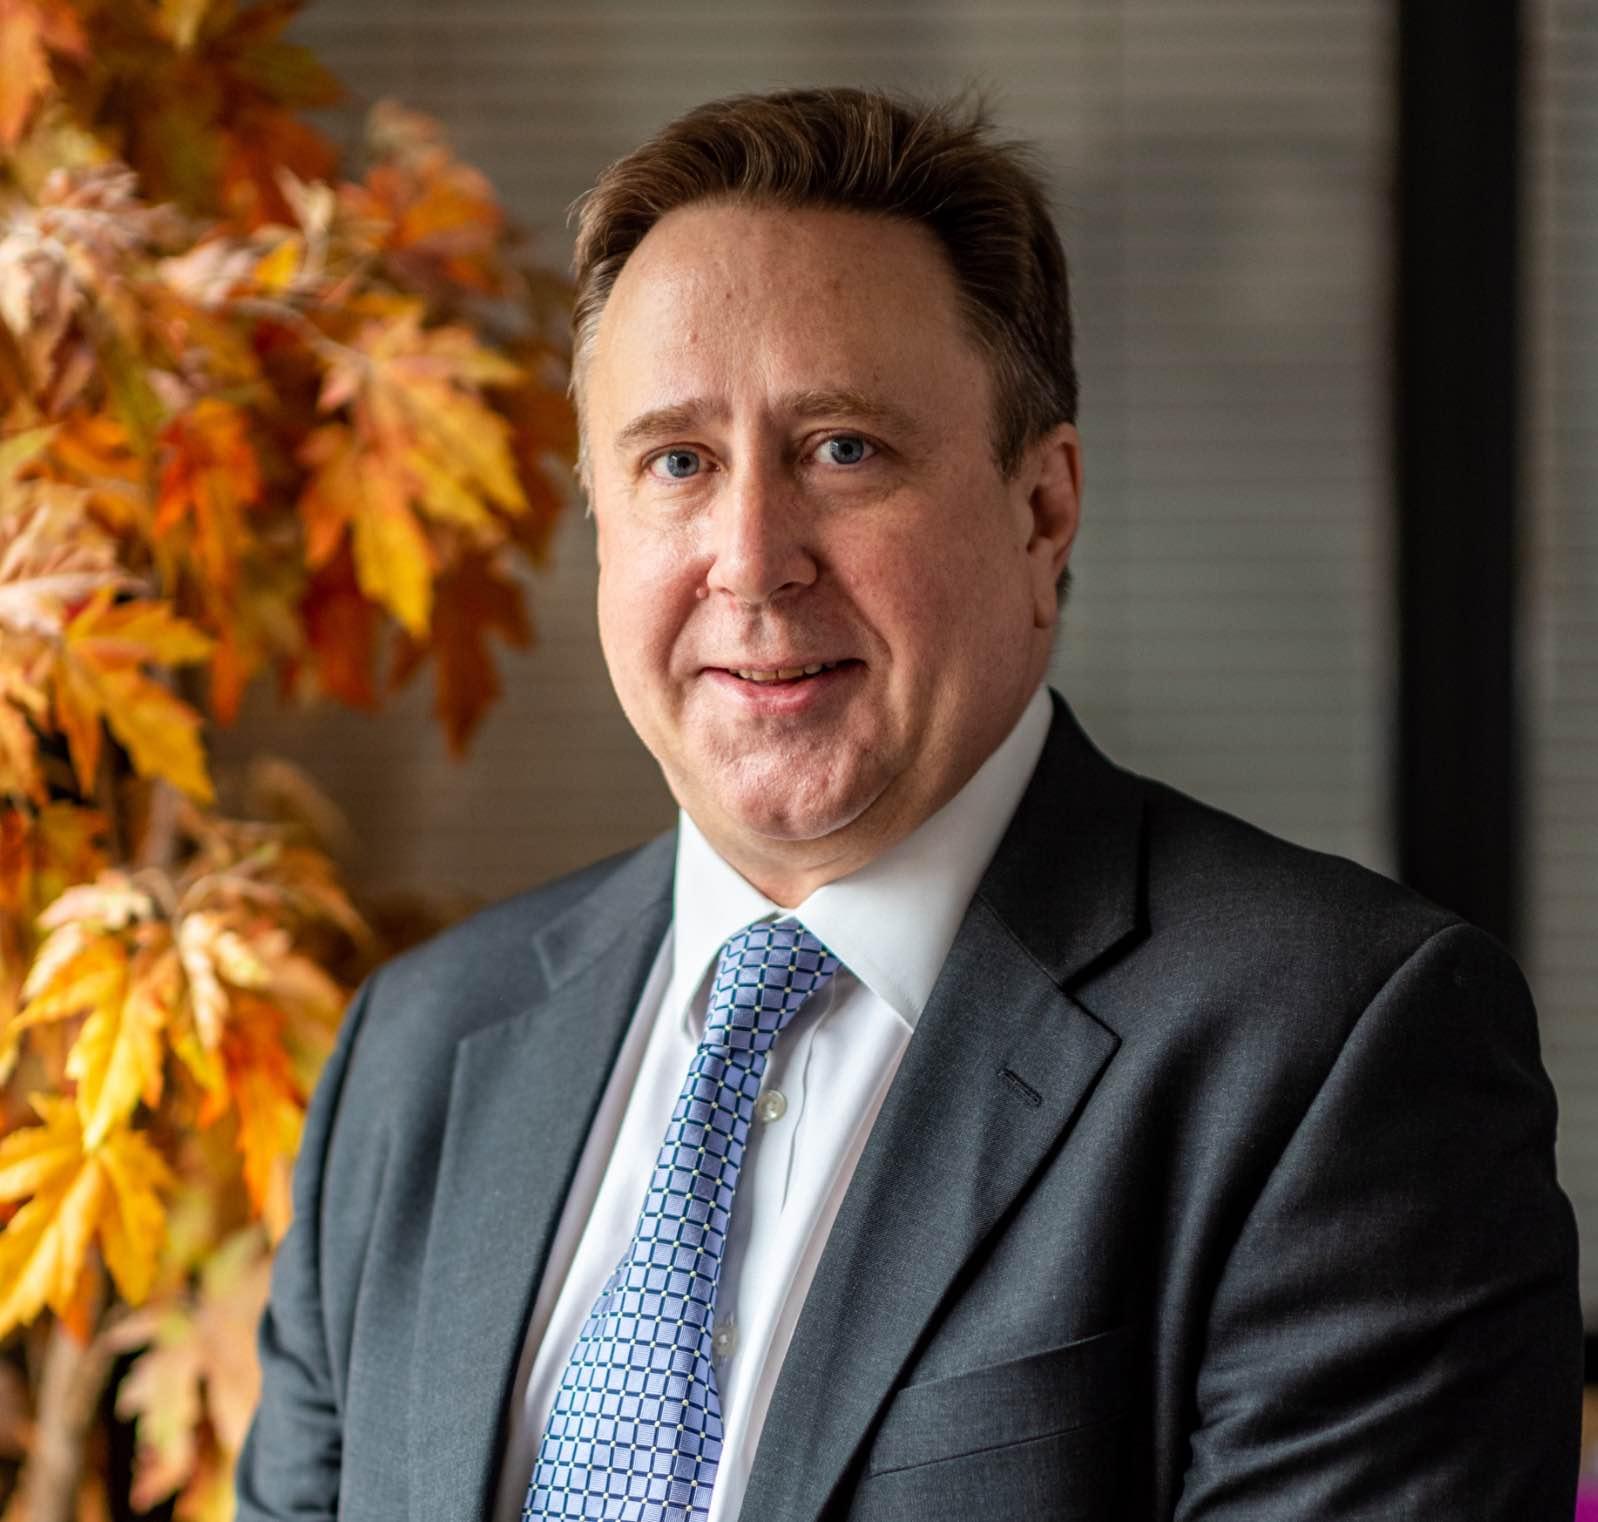 Andrew Fursdon lawyer in Devon